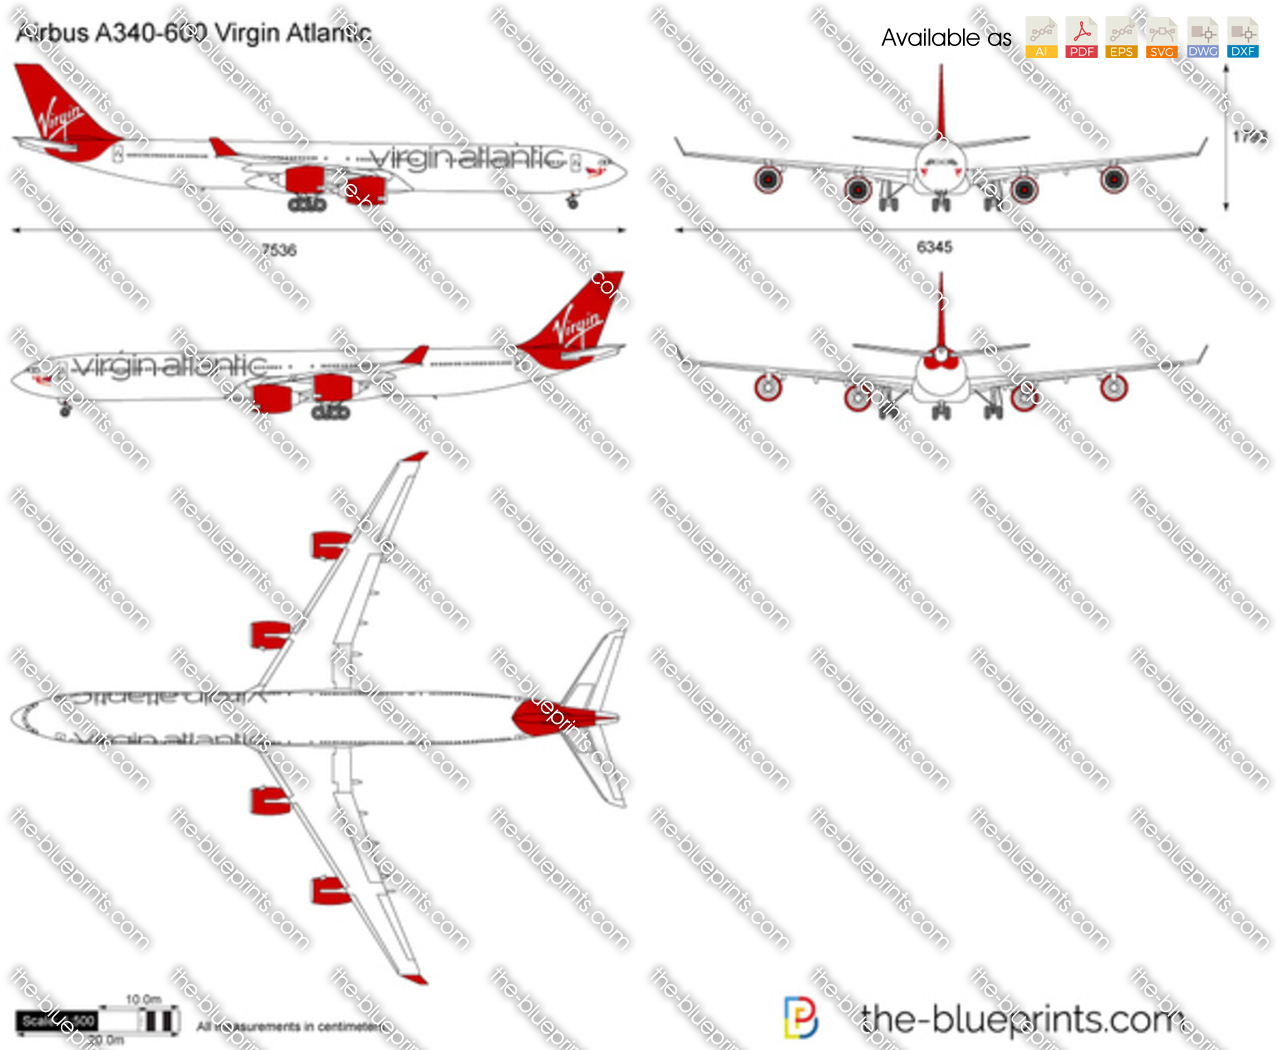 Airbus A340-600 Virgin Atlantic